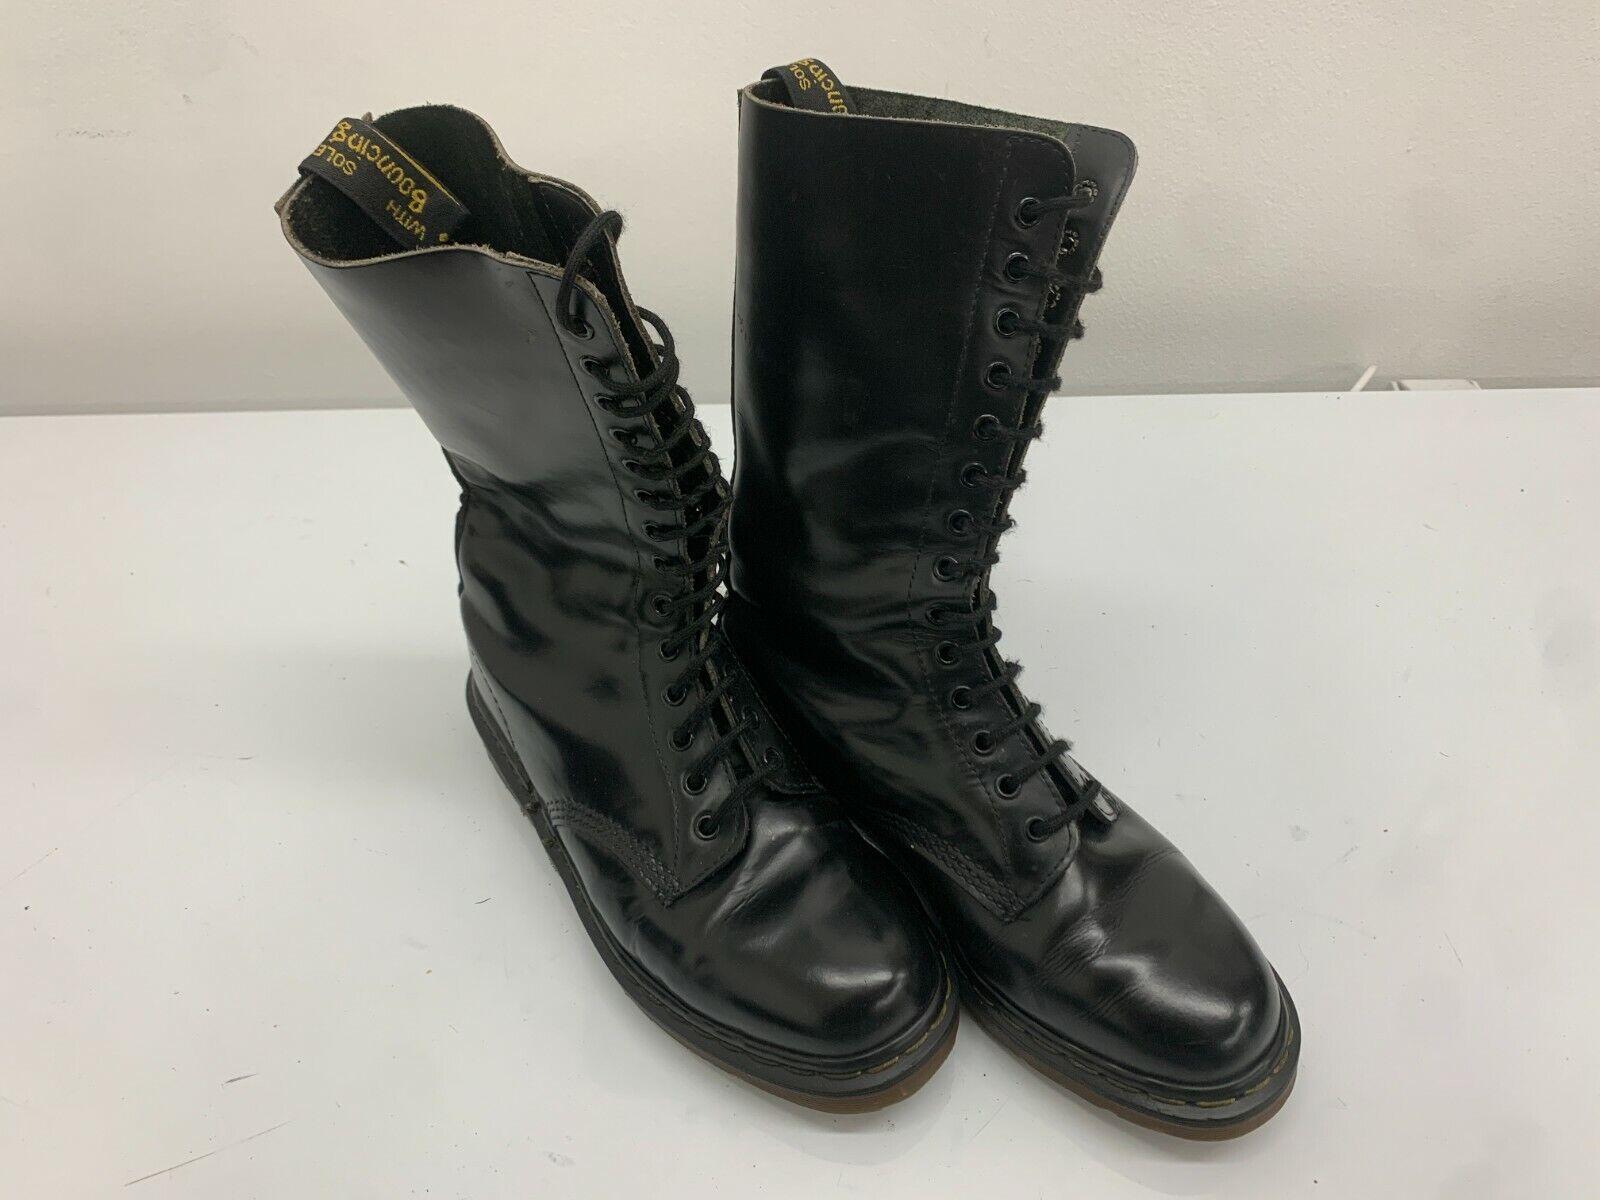 Dr Martens Boots 14 Eyelets Black Leather, Size 7UK,Made In England Doc Martens